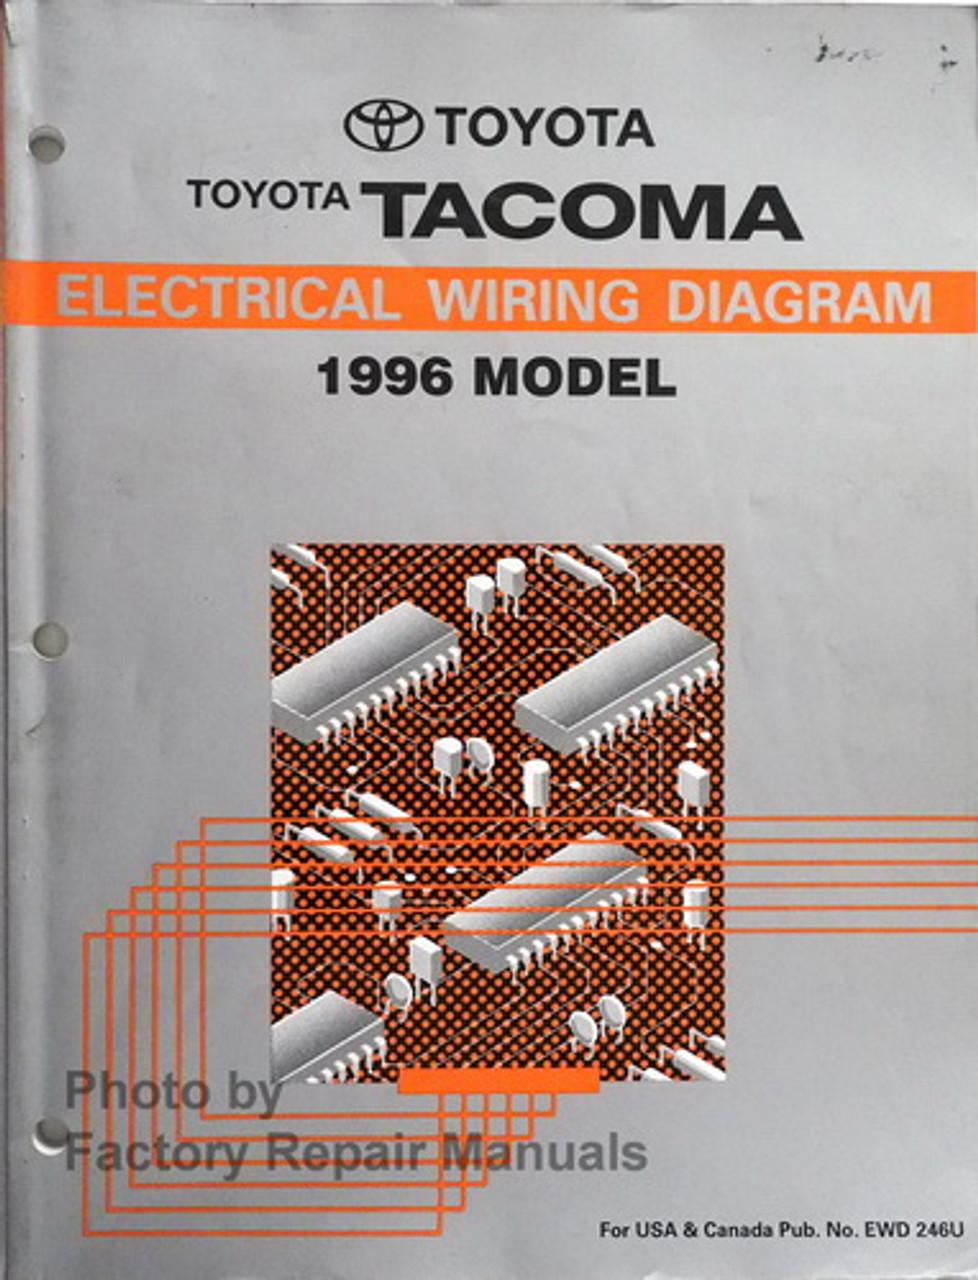 1996 Toyota Tacoma Electrical Wiring Diagrams Original Factory Manual